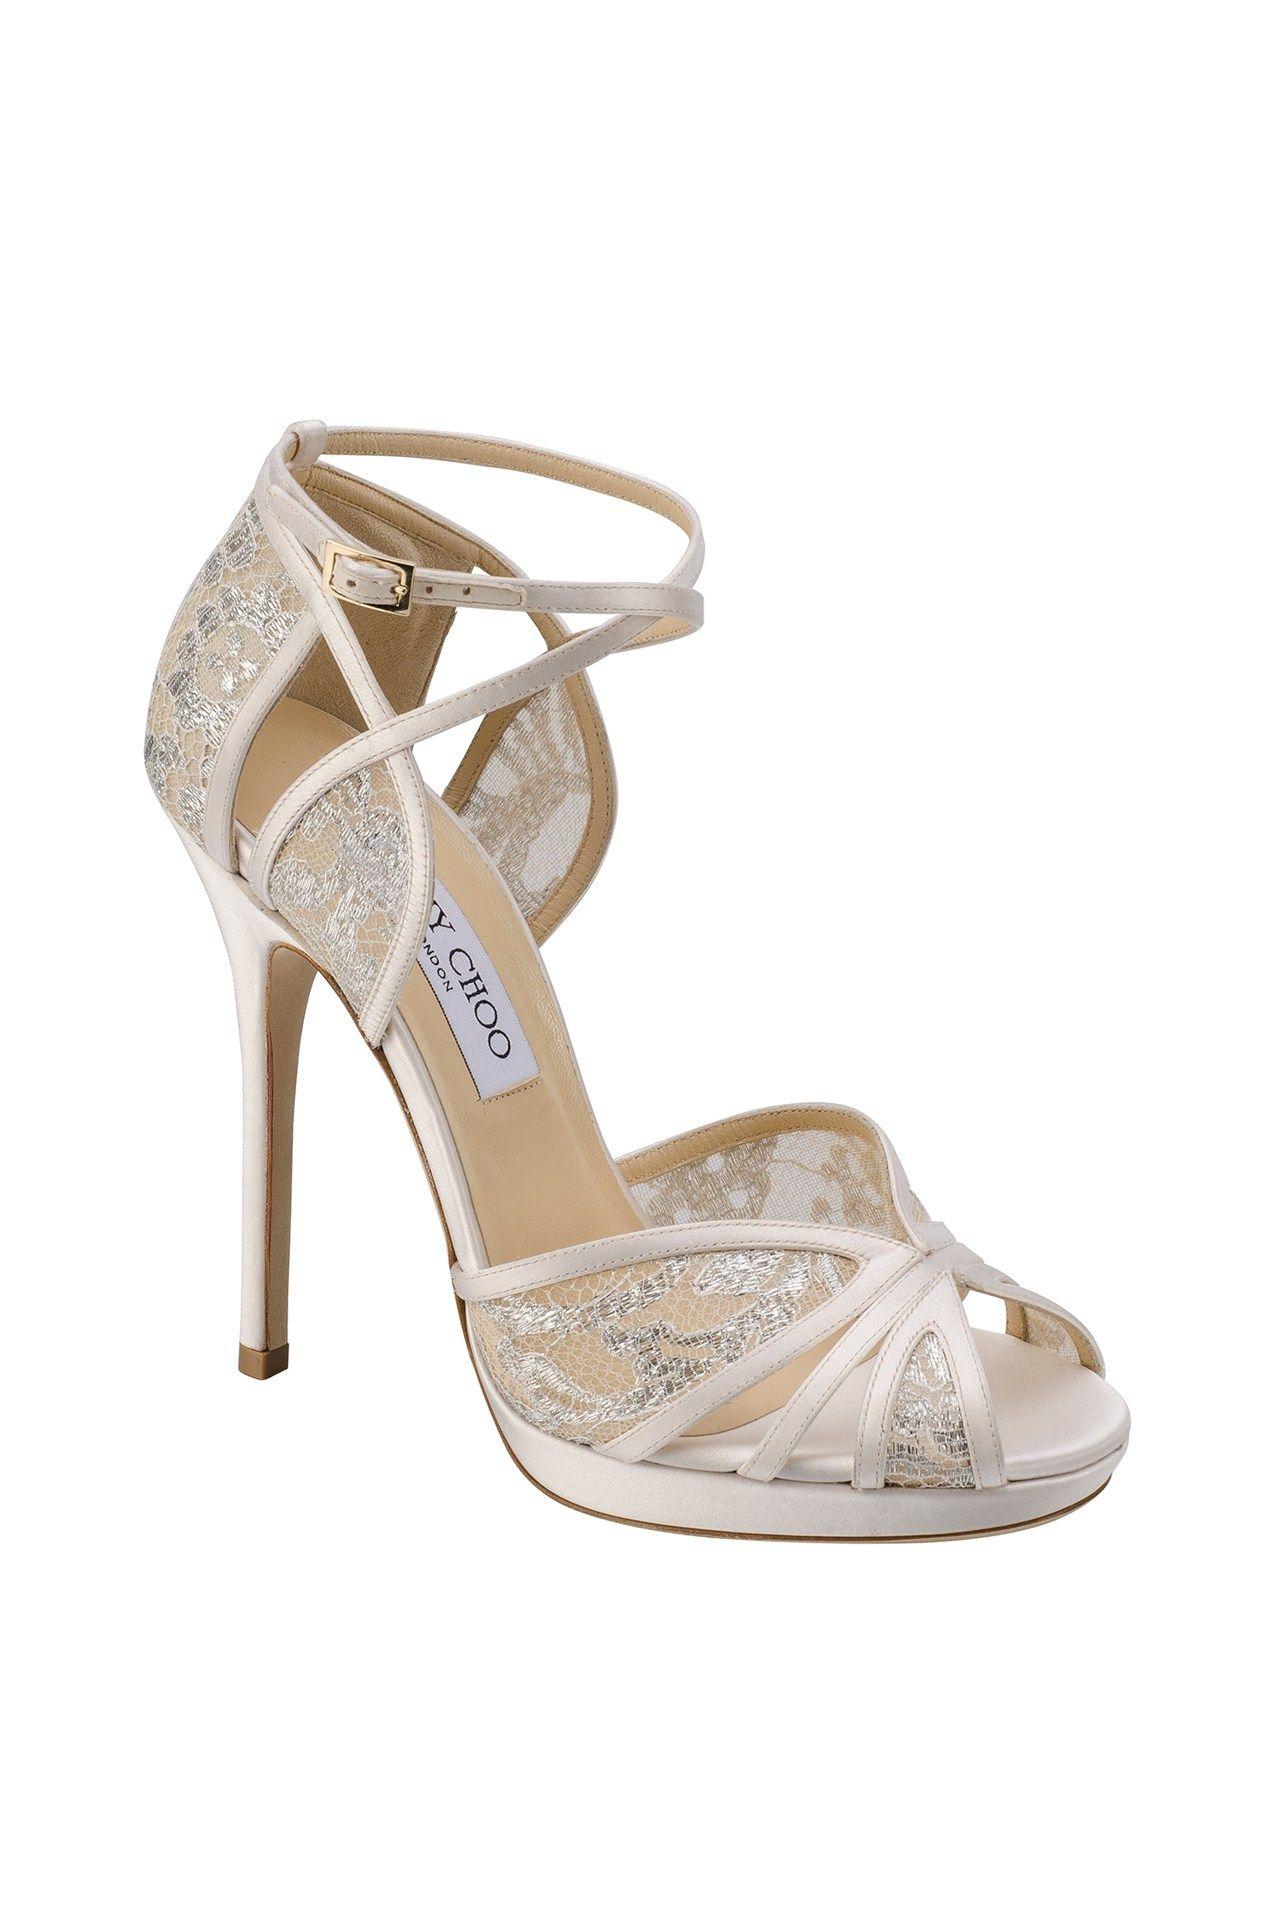 7ad73d9b03c Best Wedding Shoes - Latest Bridal Shoes Styles (BridesMagazine.co.uk)  (BridesMagazine.co.uk). Jimmy Choo ...